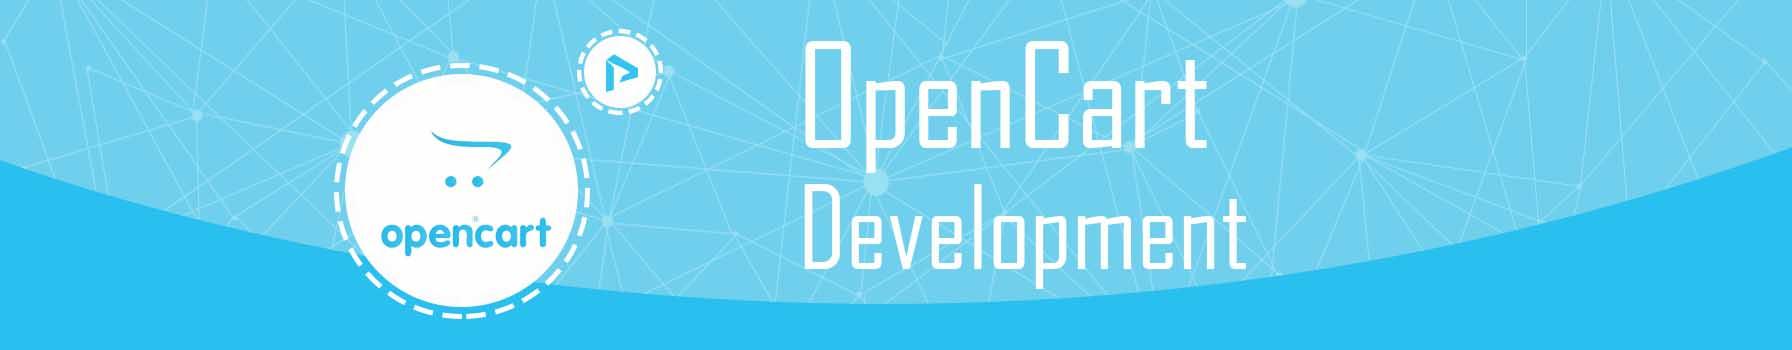 opencart-development.jpg